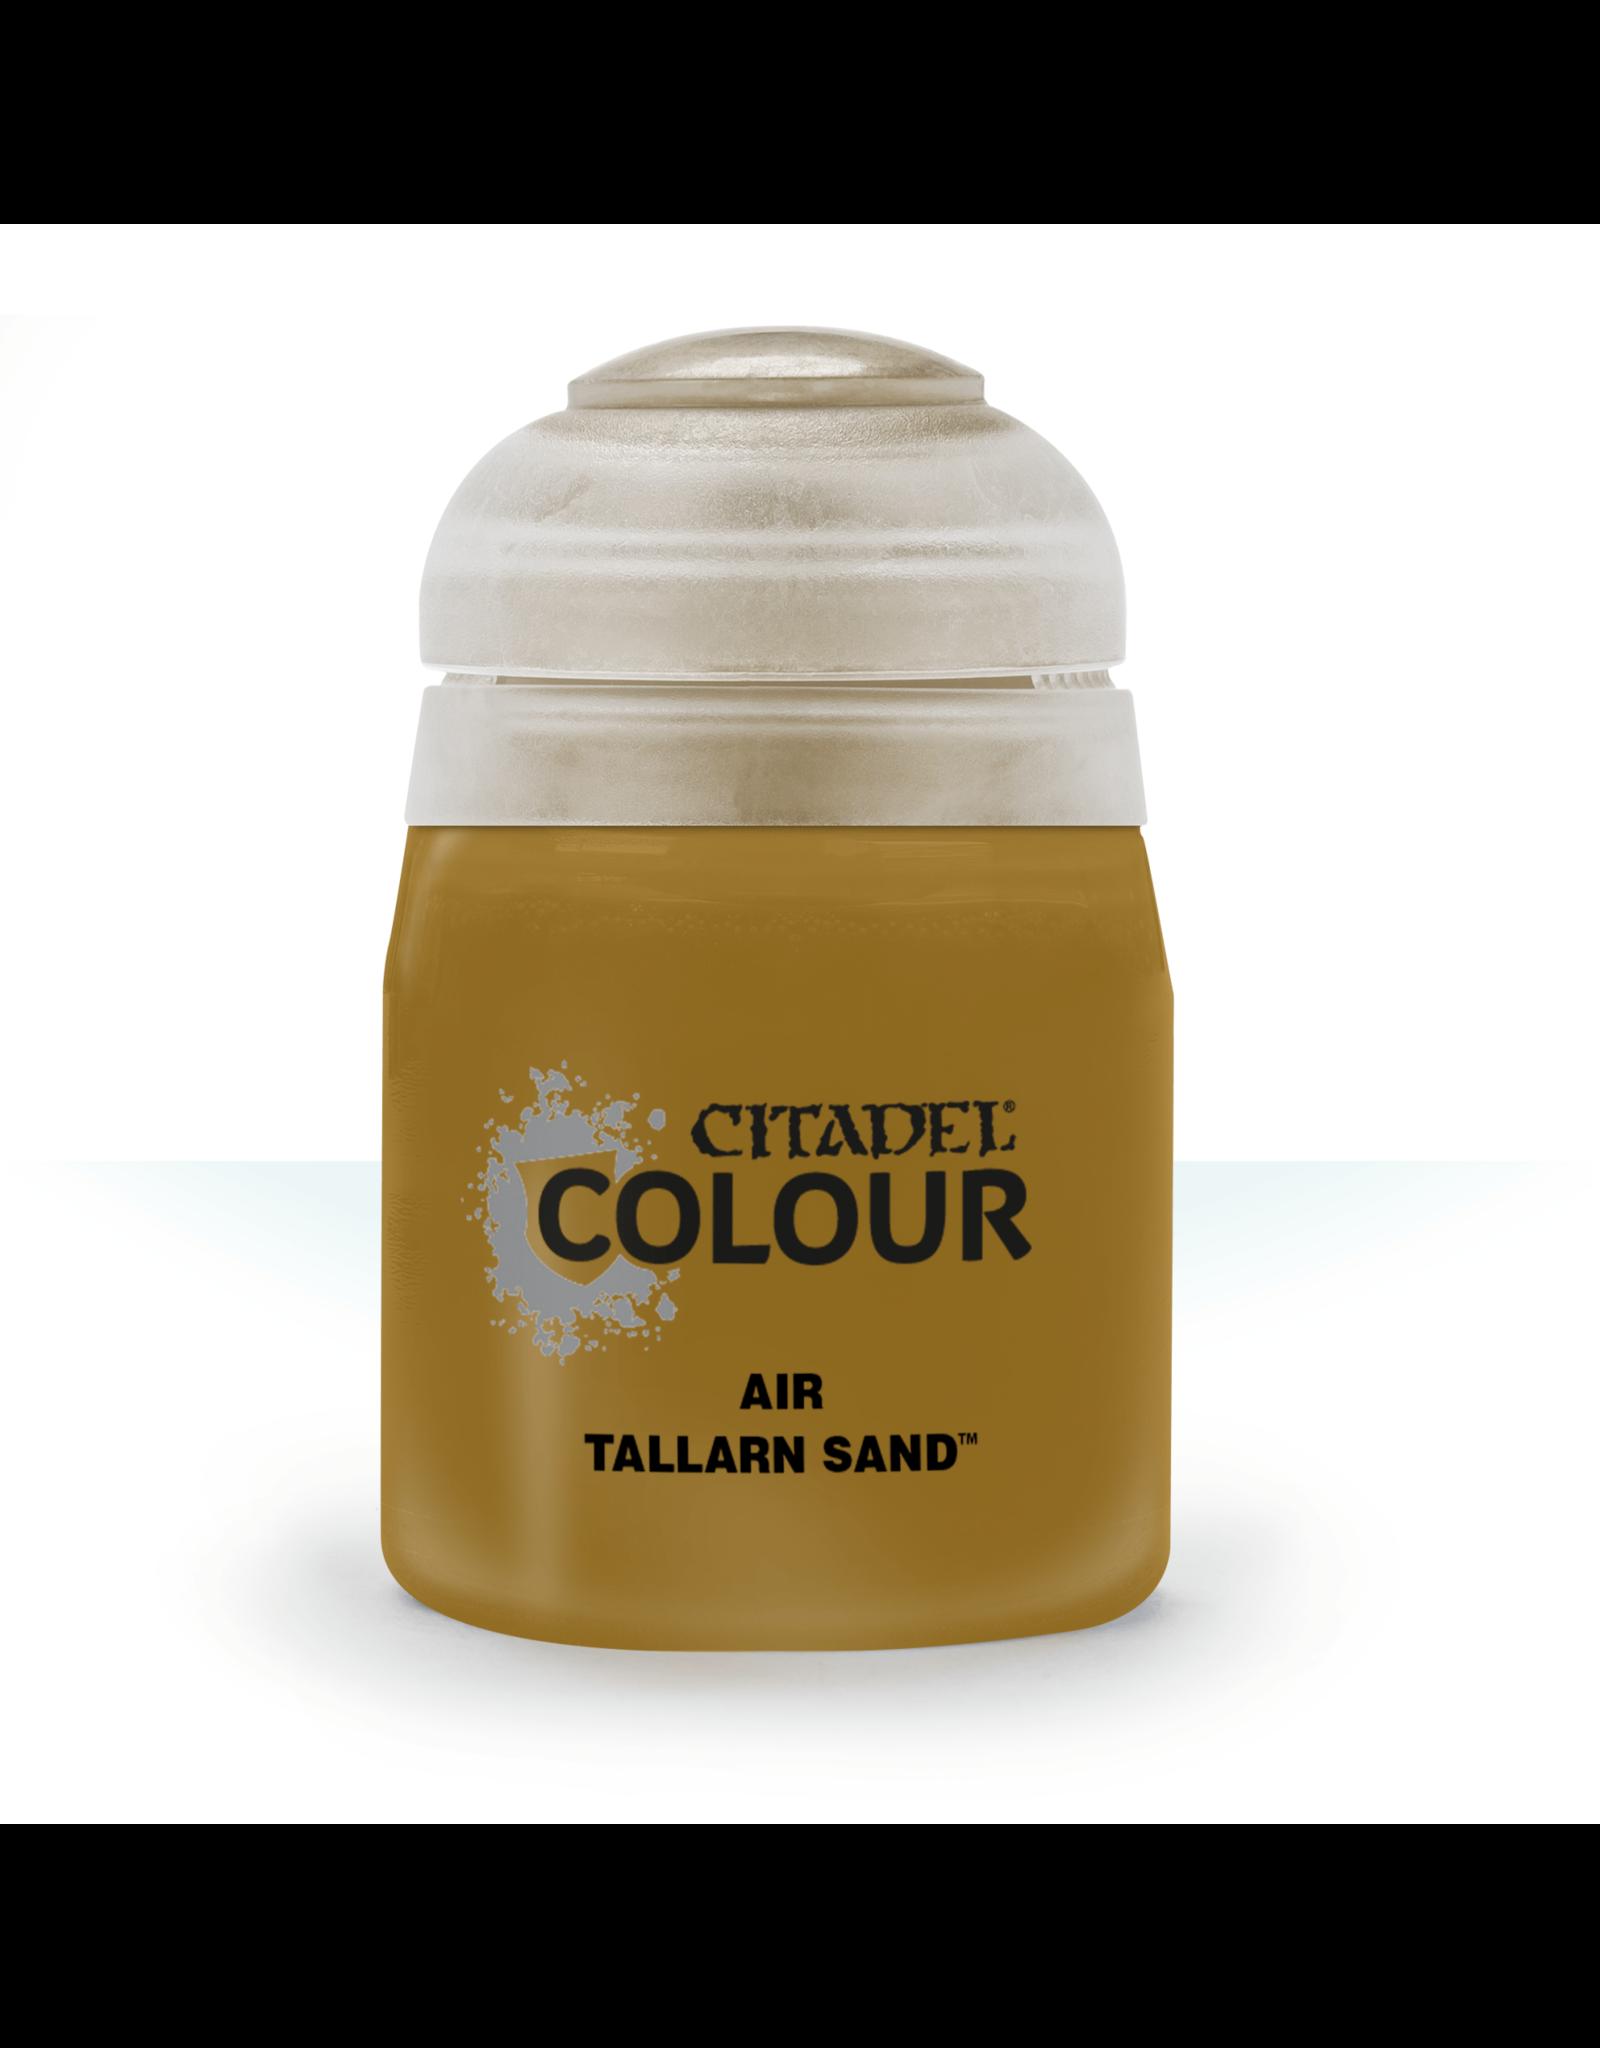 Citadel Citadel Paints Air Paint Tallarn Sand